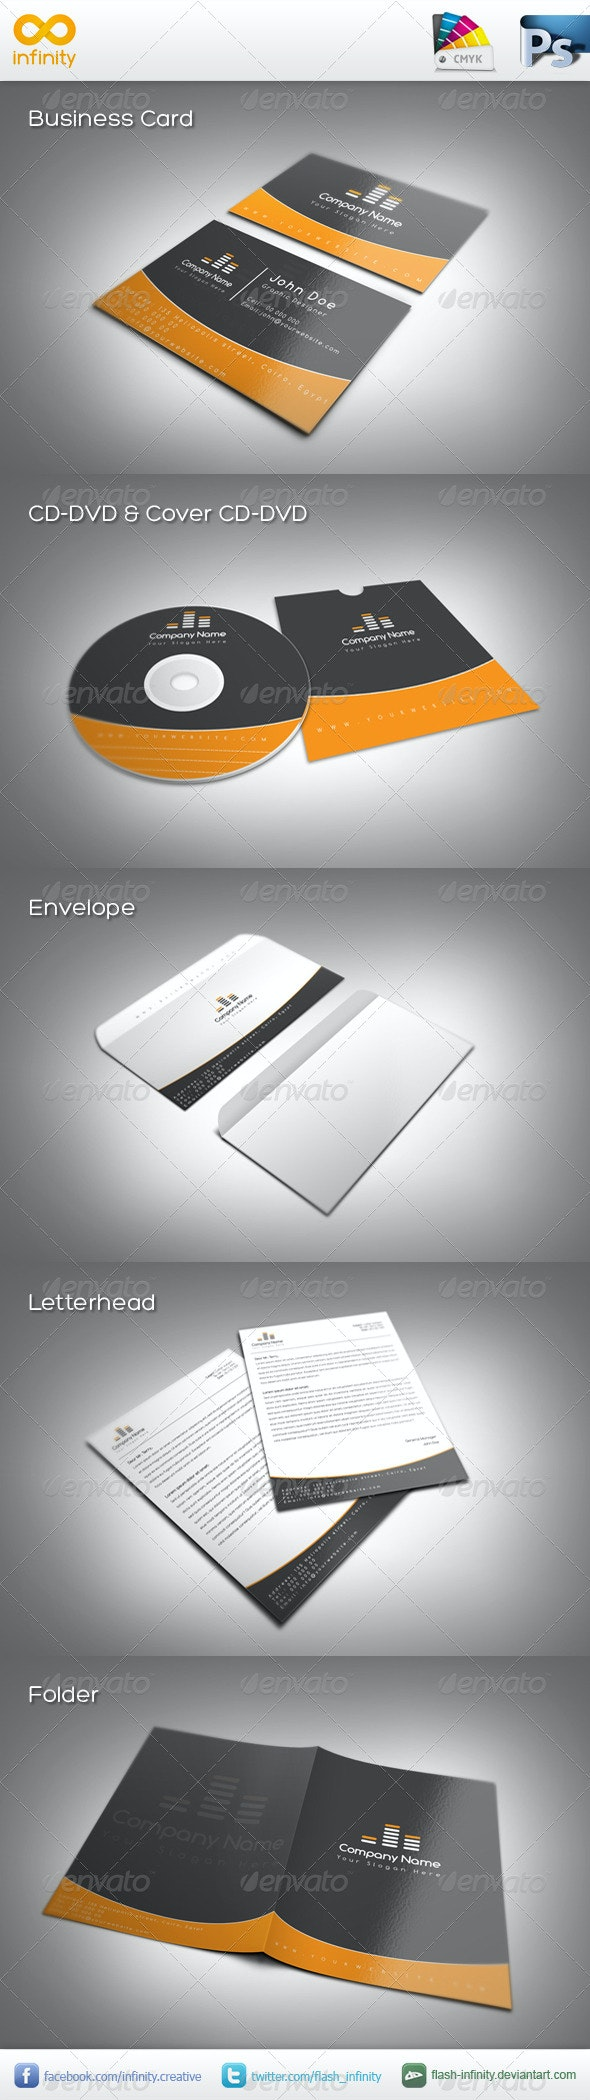 Corporate Identity 1 - Stationery Print Templates